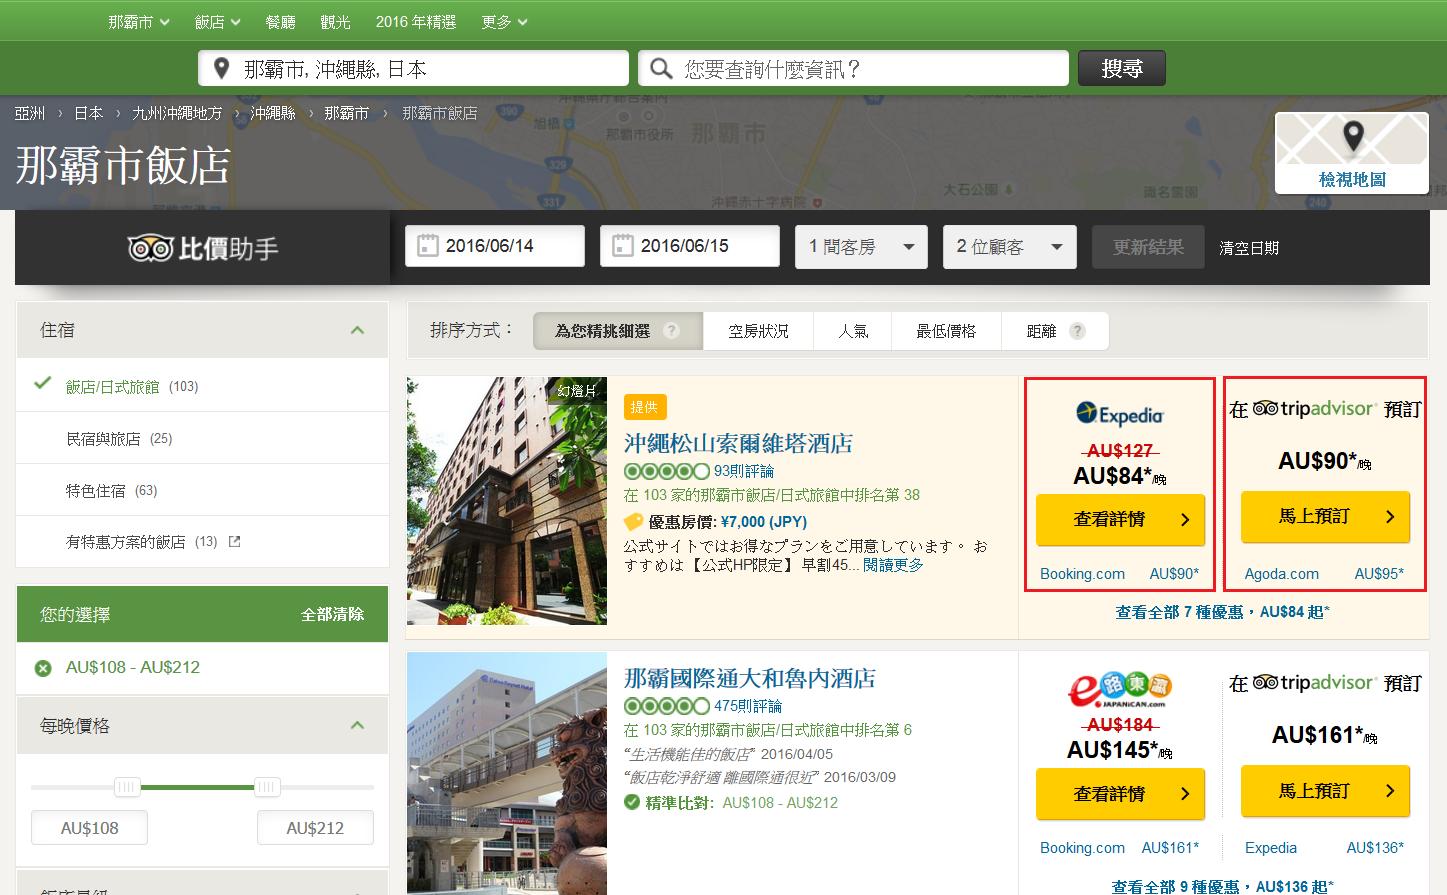 tripadvisor-住宿-訂房網站-比價平台-推薦-自由行-旅遊